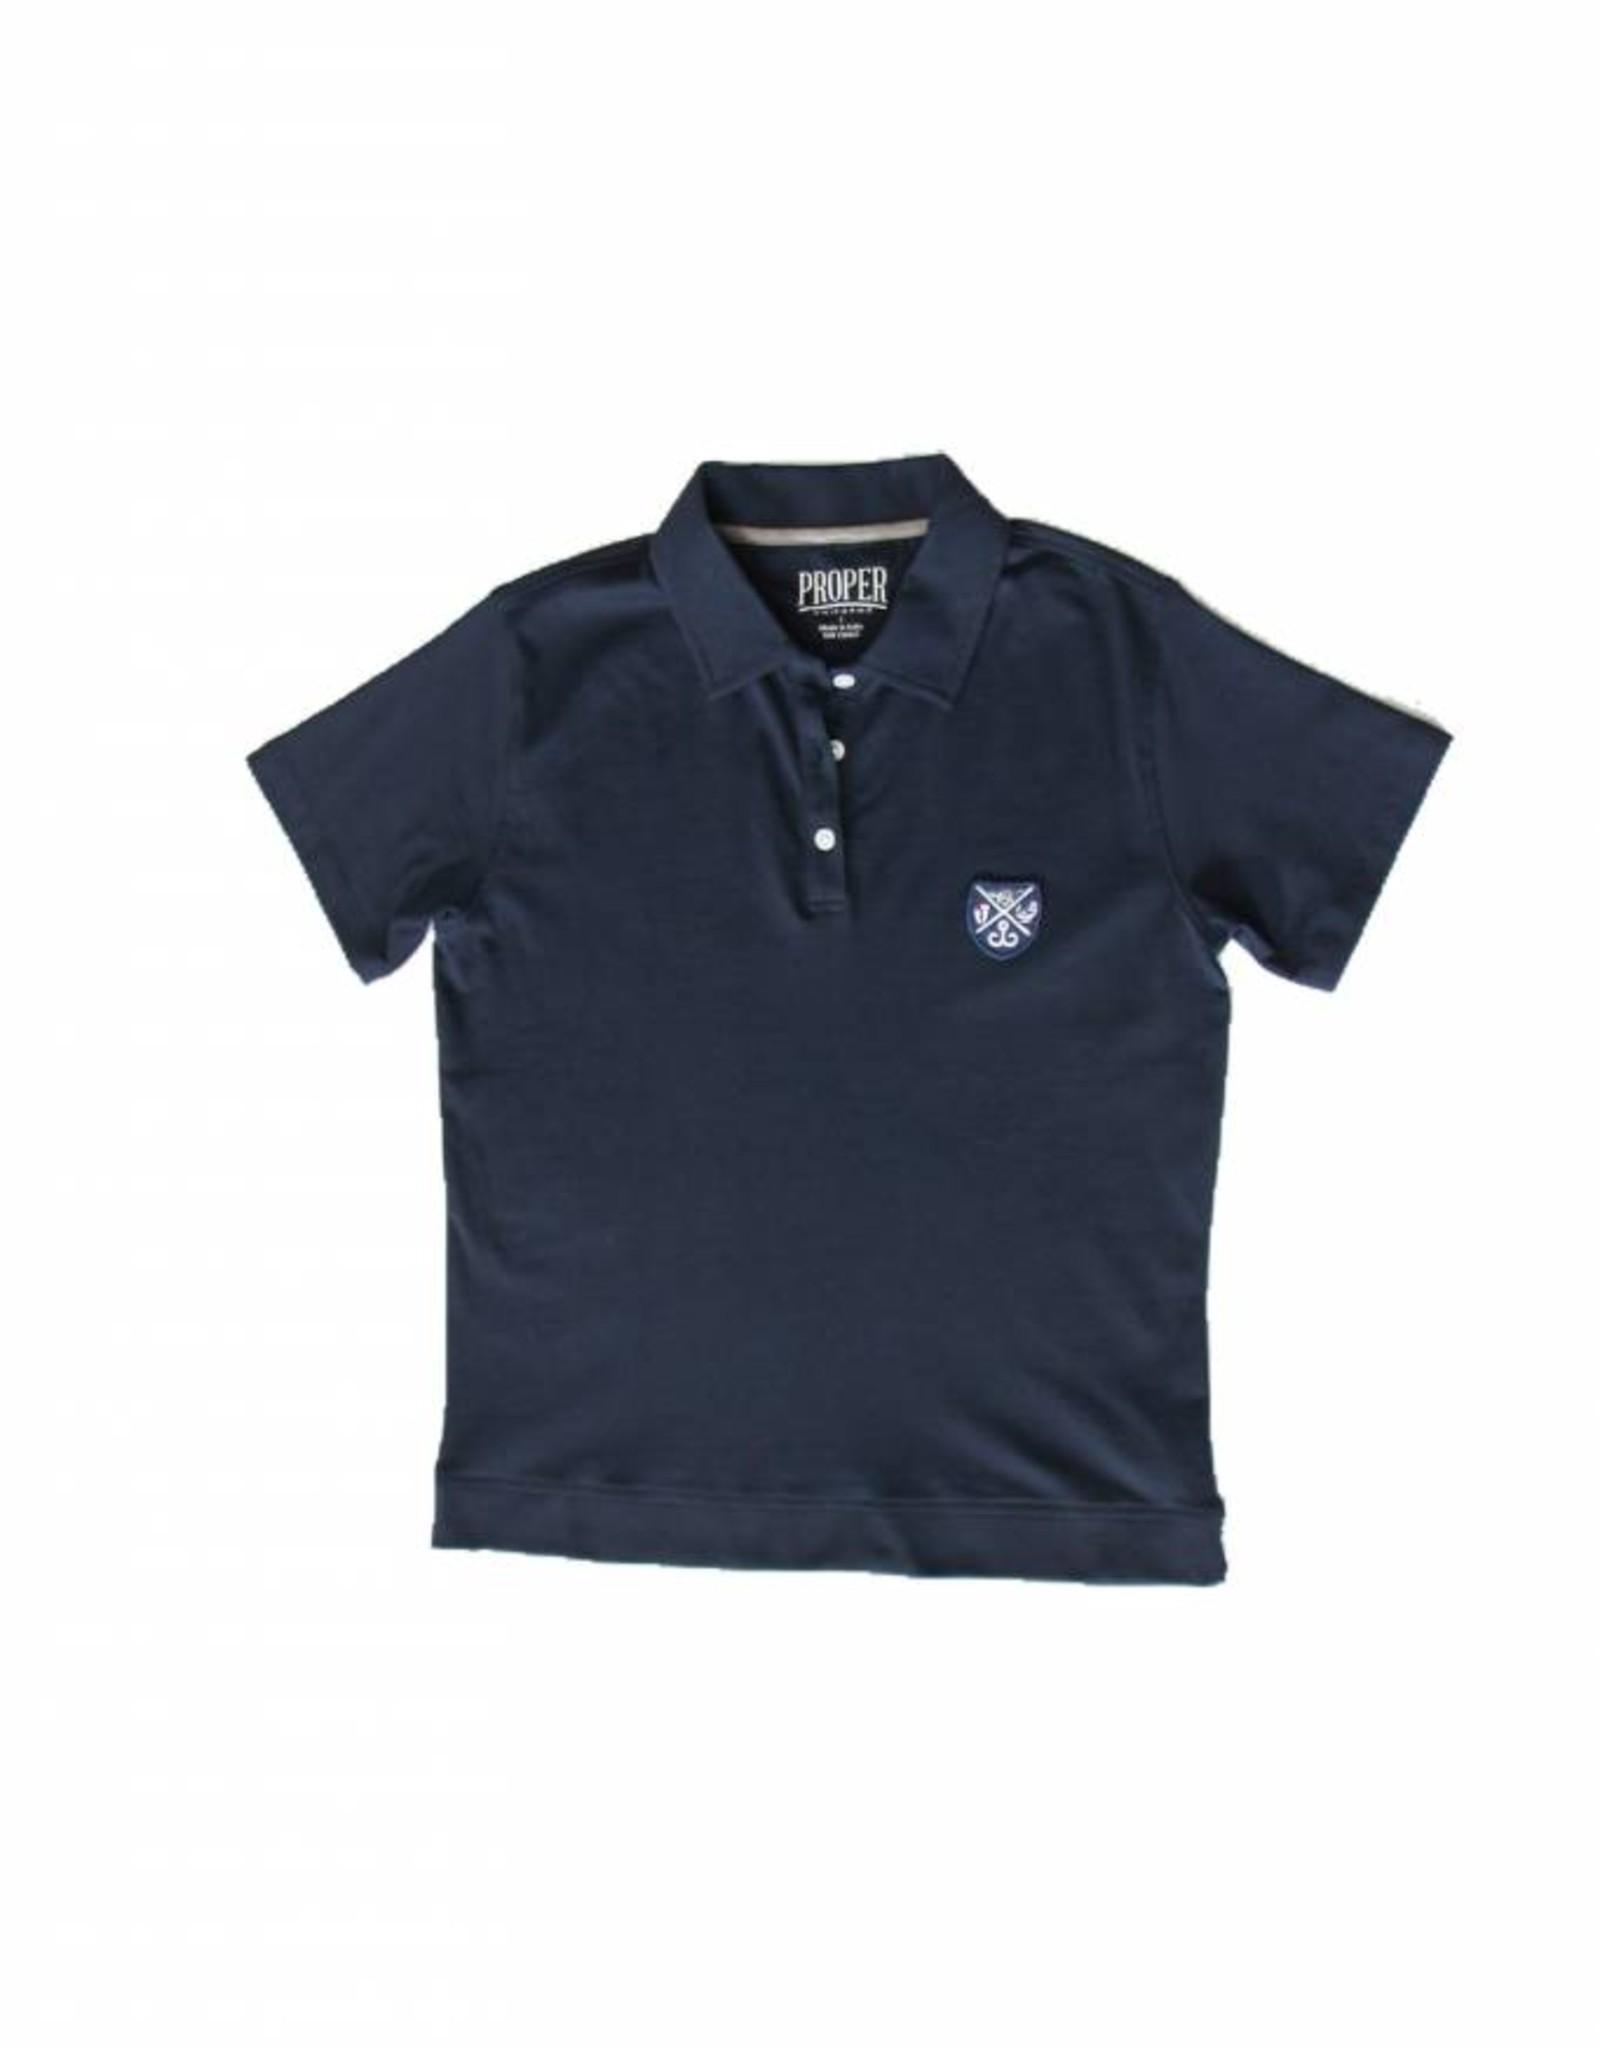 Proper Uniforms SHIRT-SS Pique, Adult